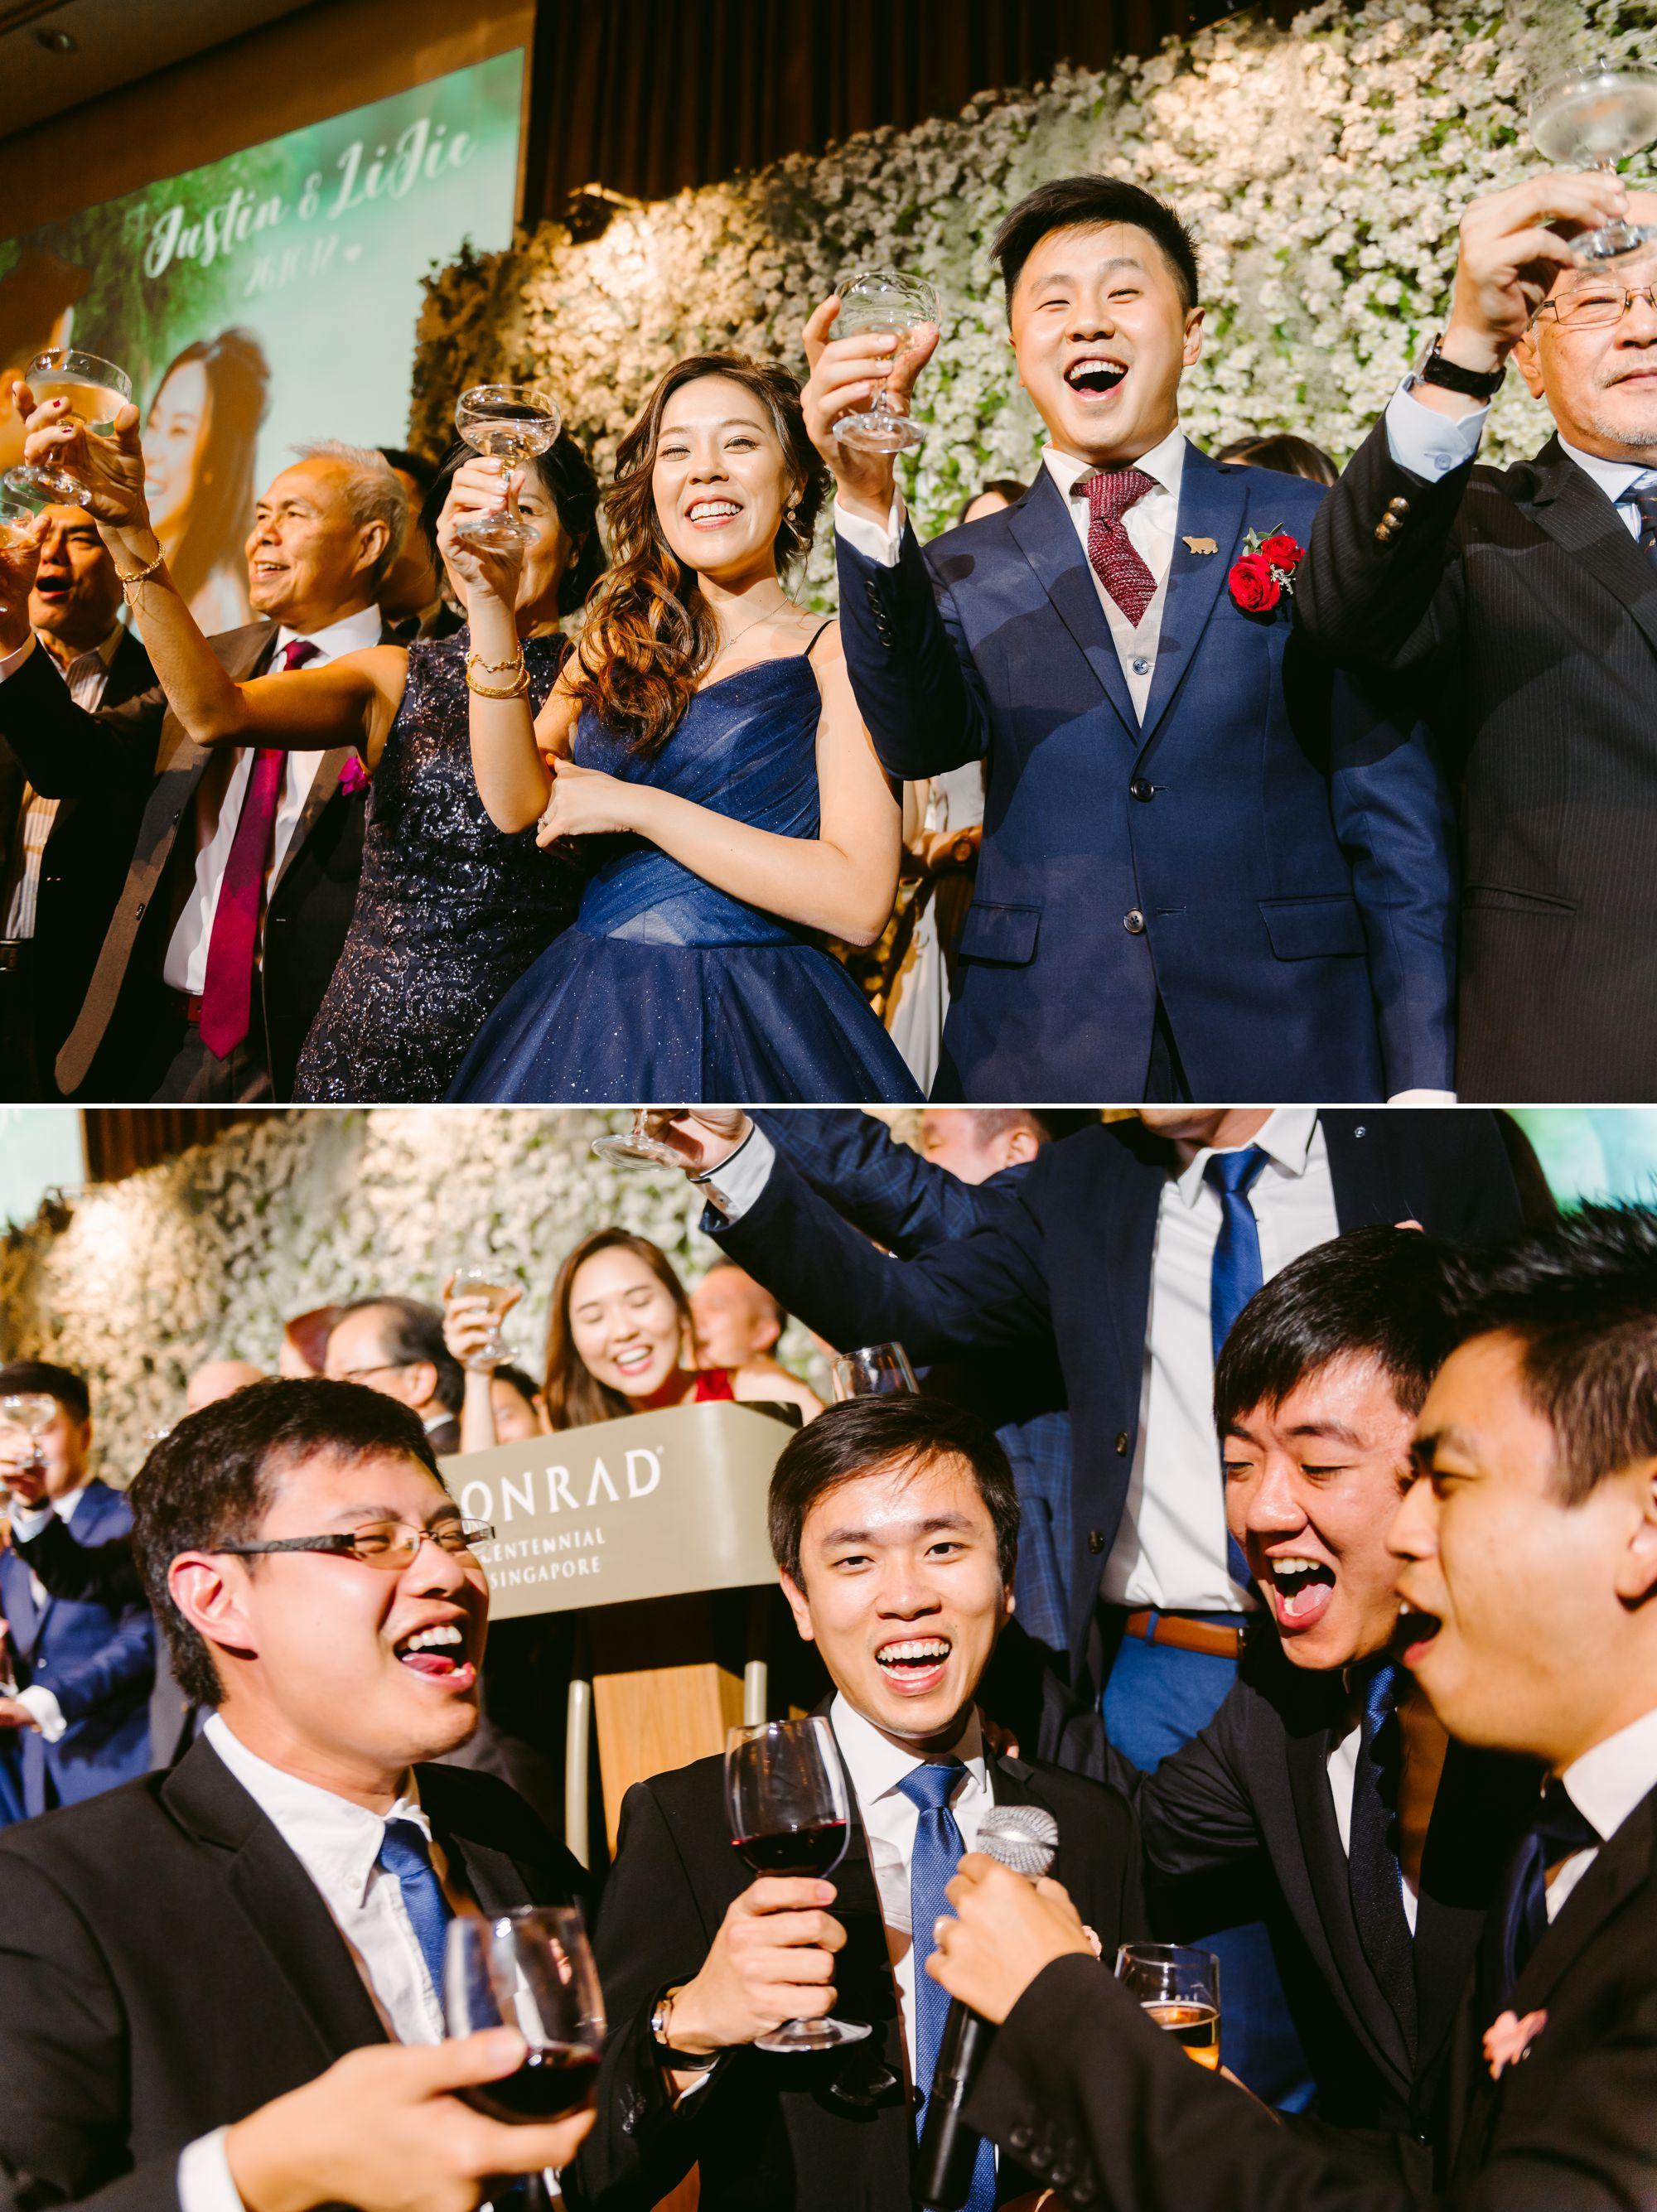 conrad_wedding_Singapore_ 42.jpg